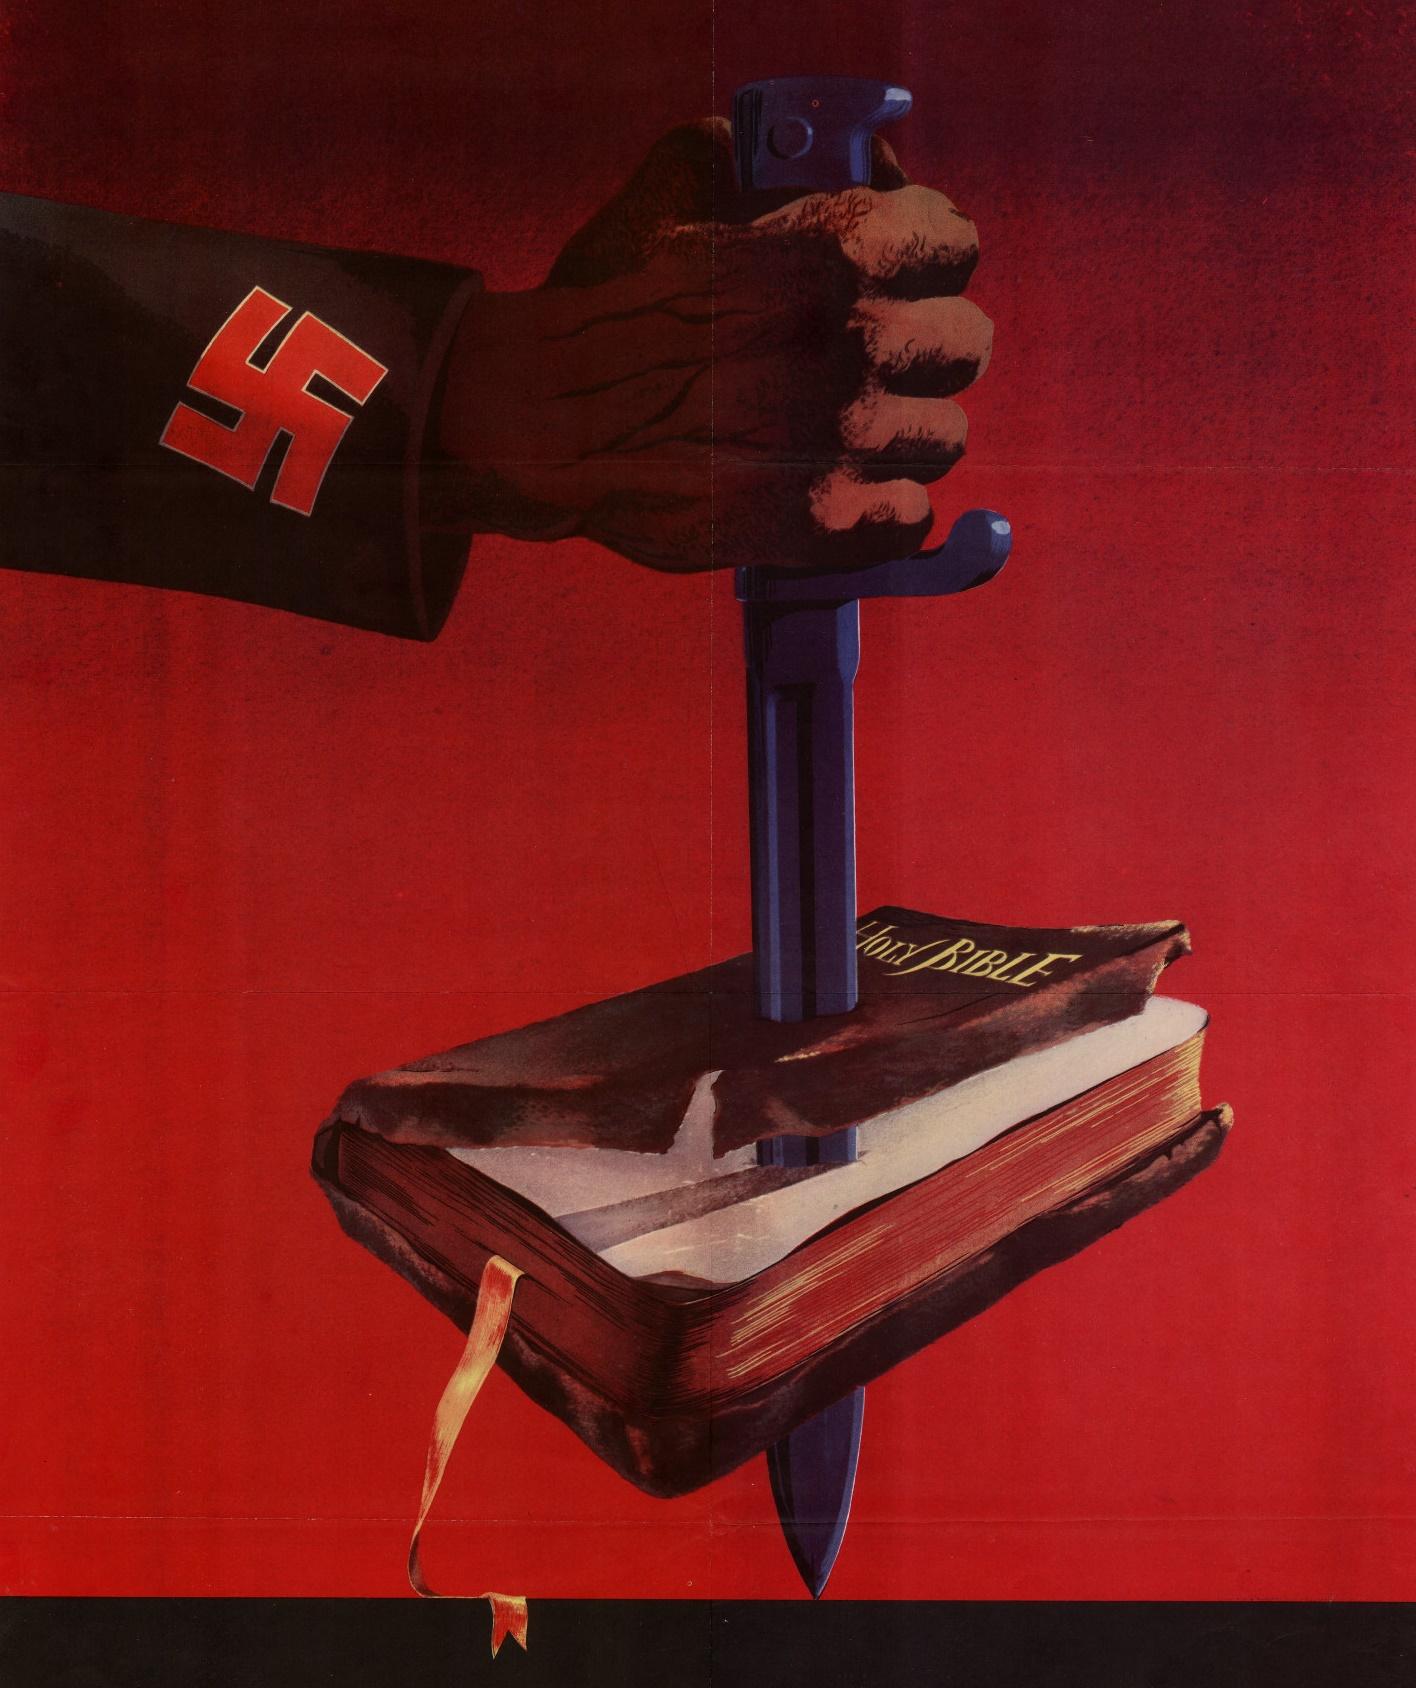 naziantichristian